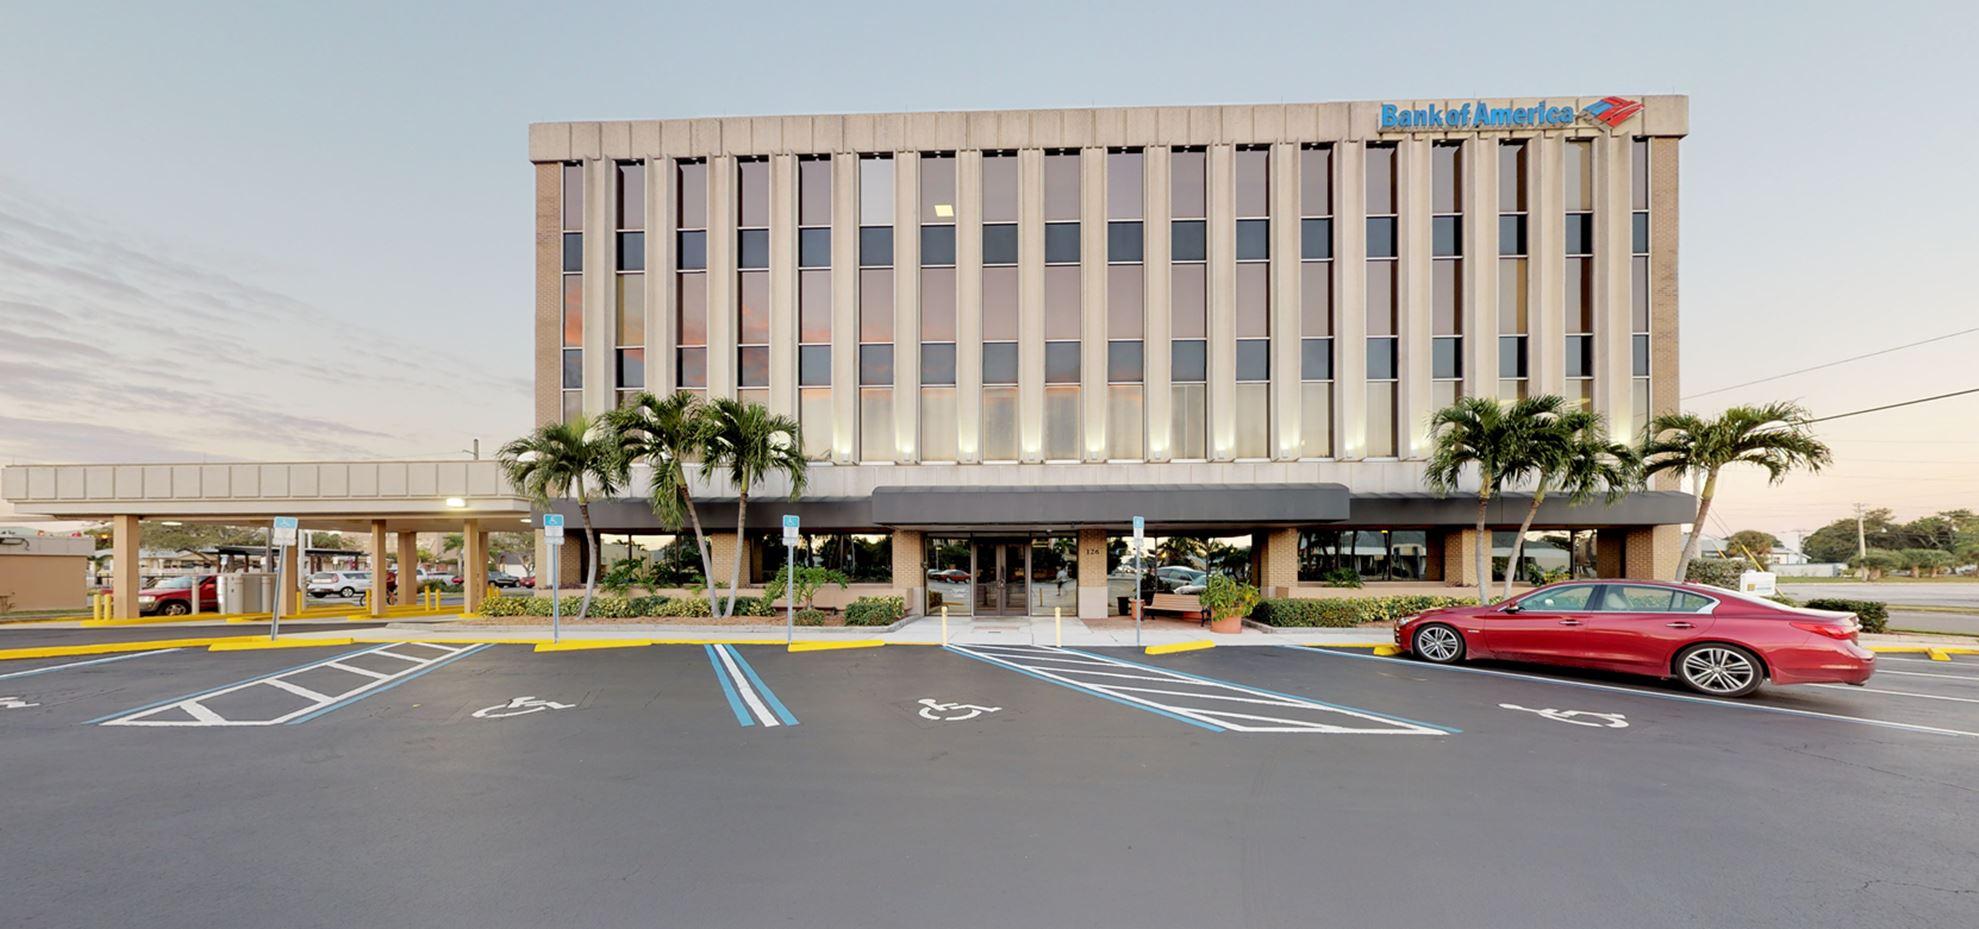 Bank of America financial center with drive-thru ATM | 126 E Olympia Ave, Punta Gorda, FL 33950